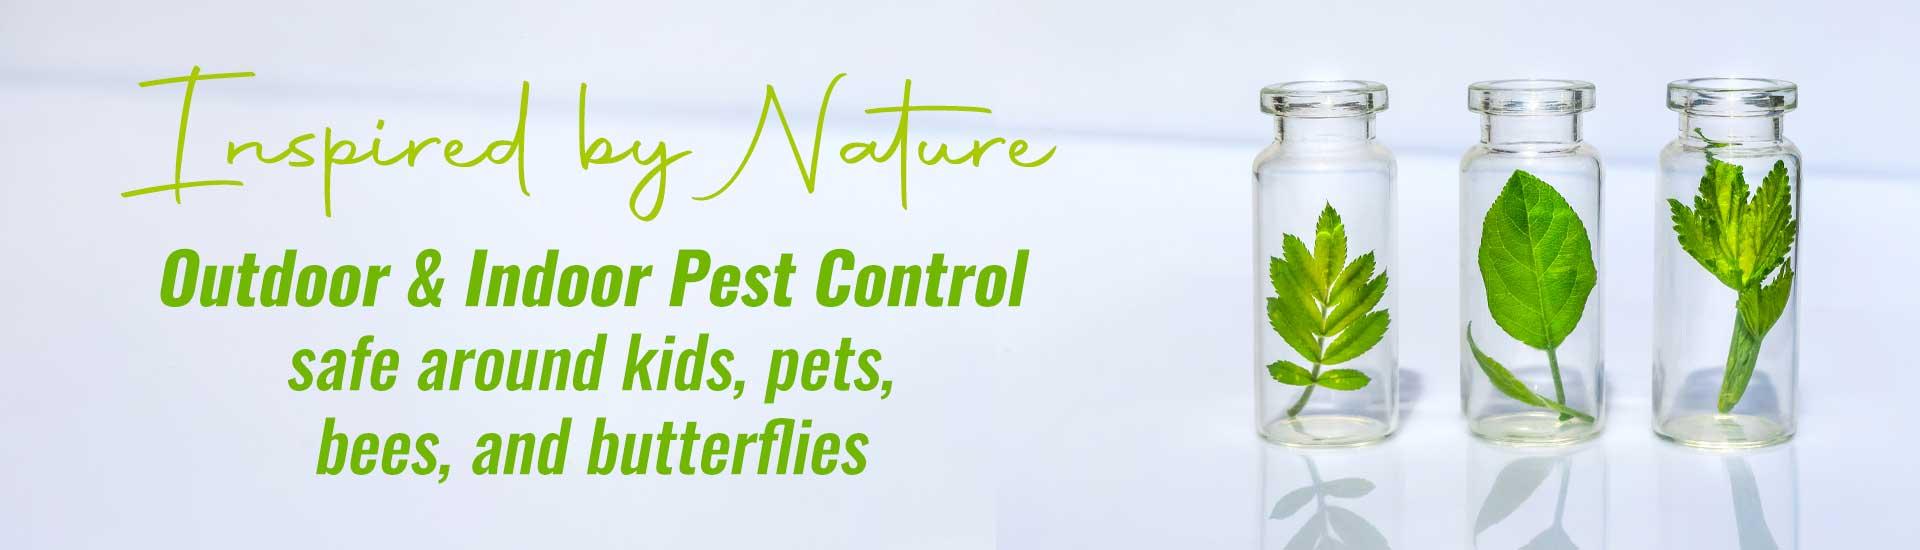 Non-Pesticide Pest Control Service Phoenix